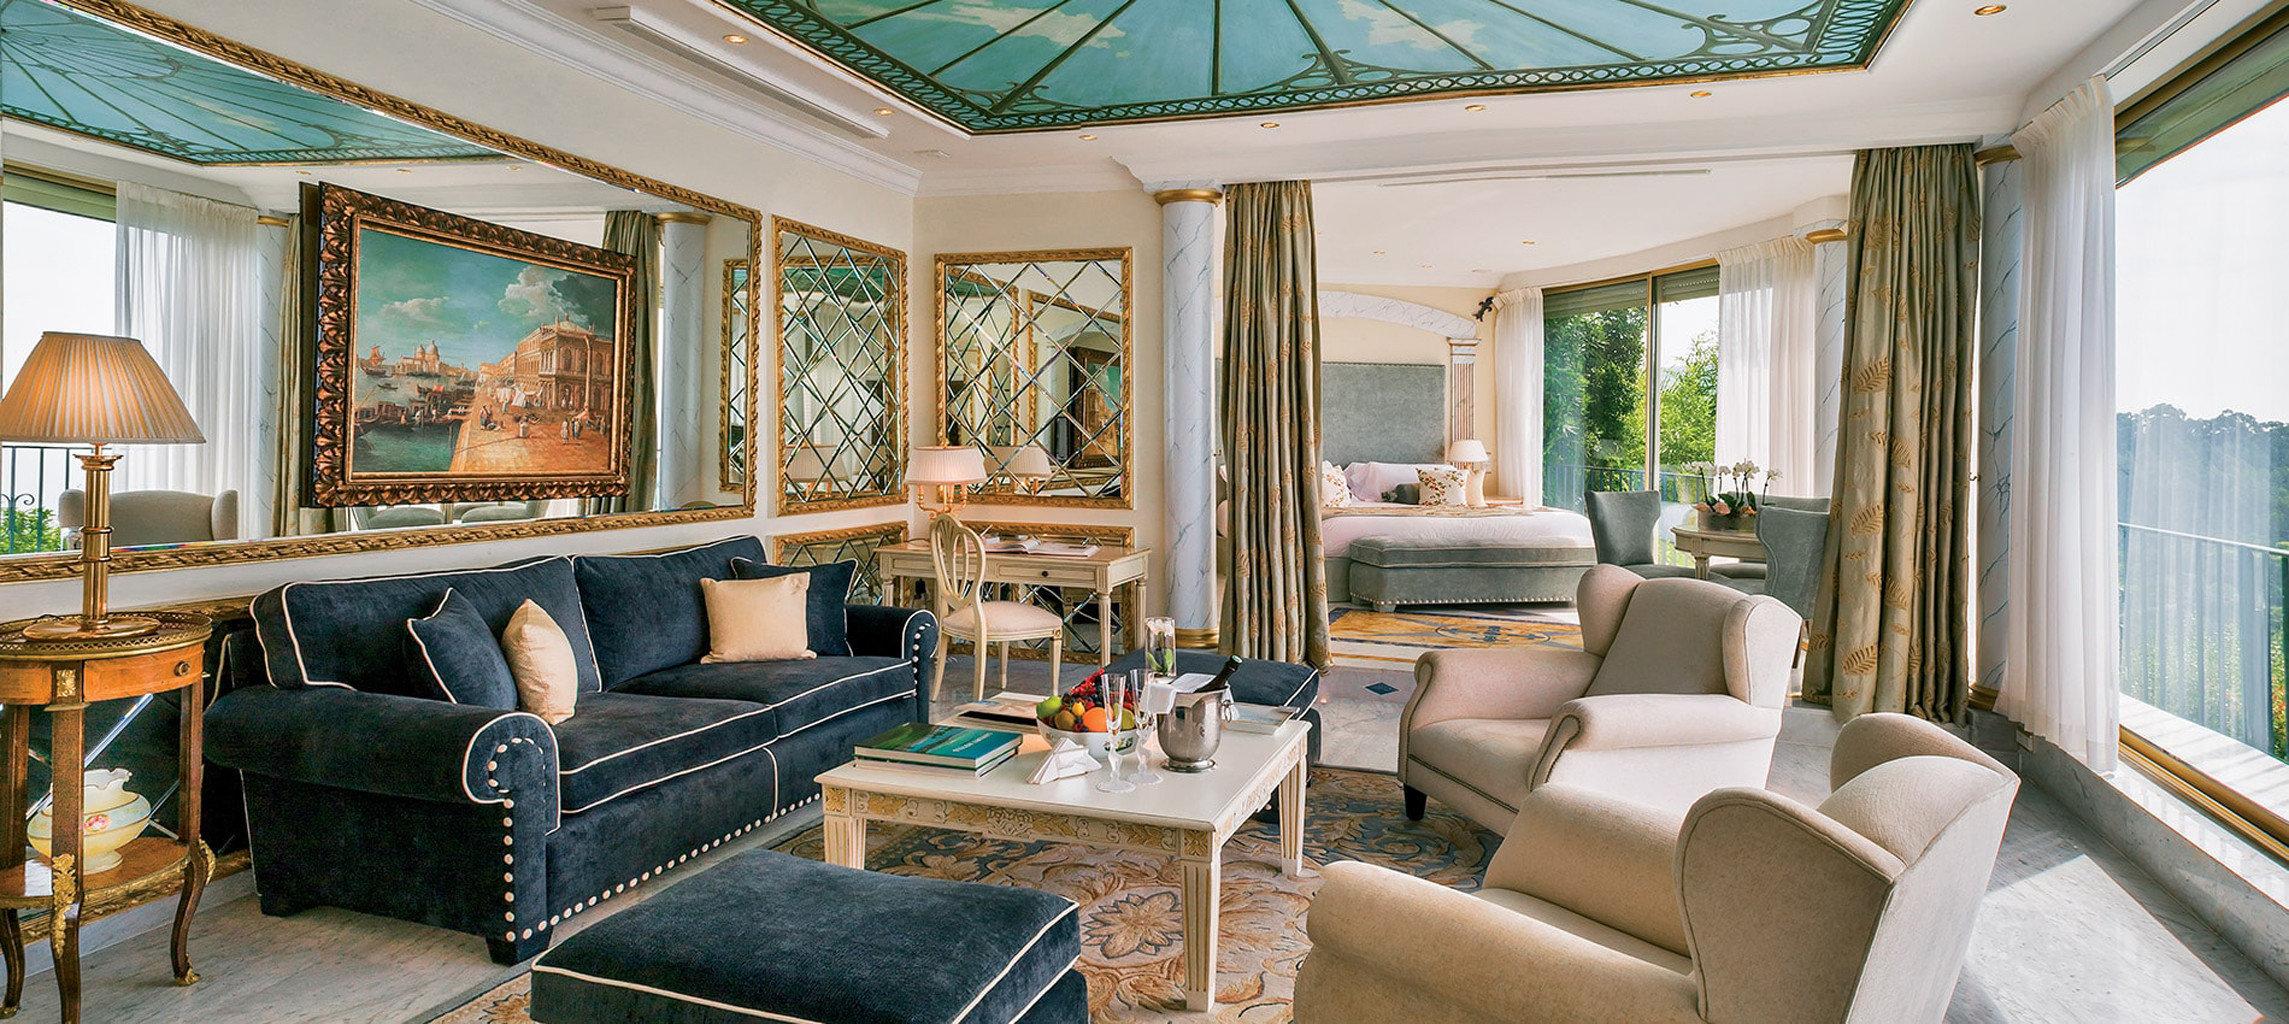 sofa chair property home living room Resort condominium mansion Villa vehicle porch cottage Suite leather